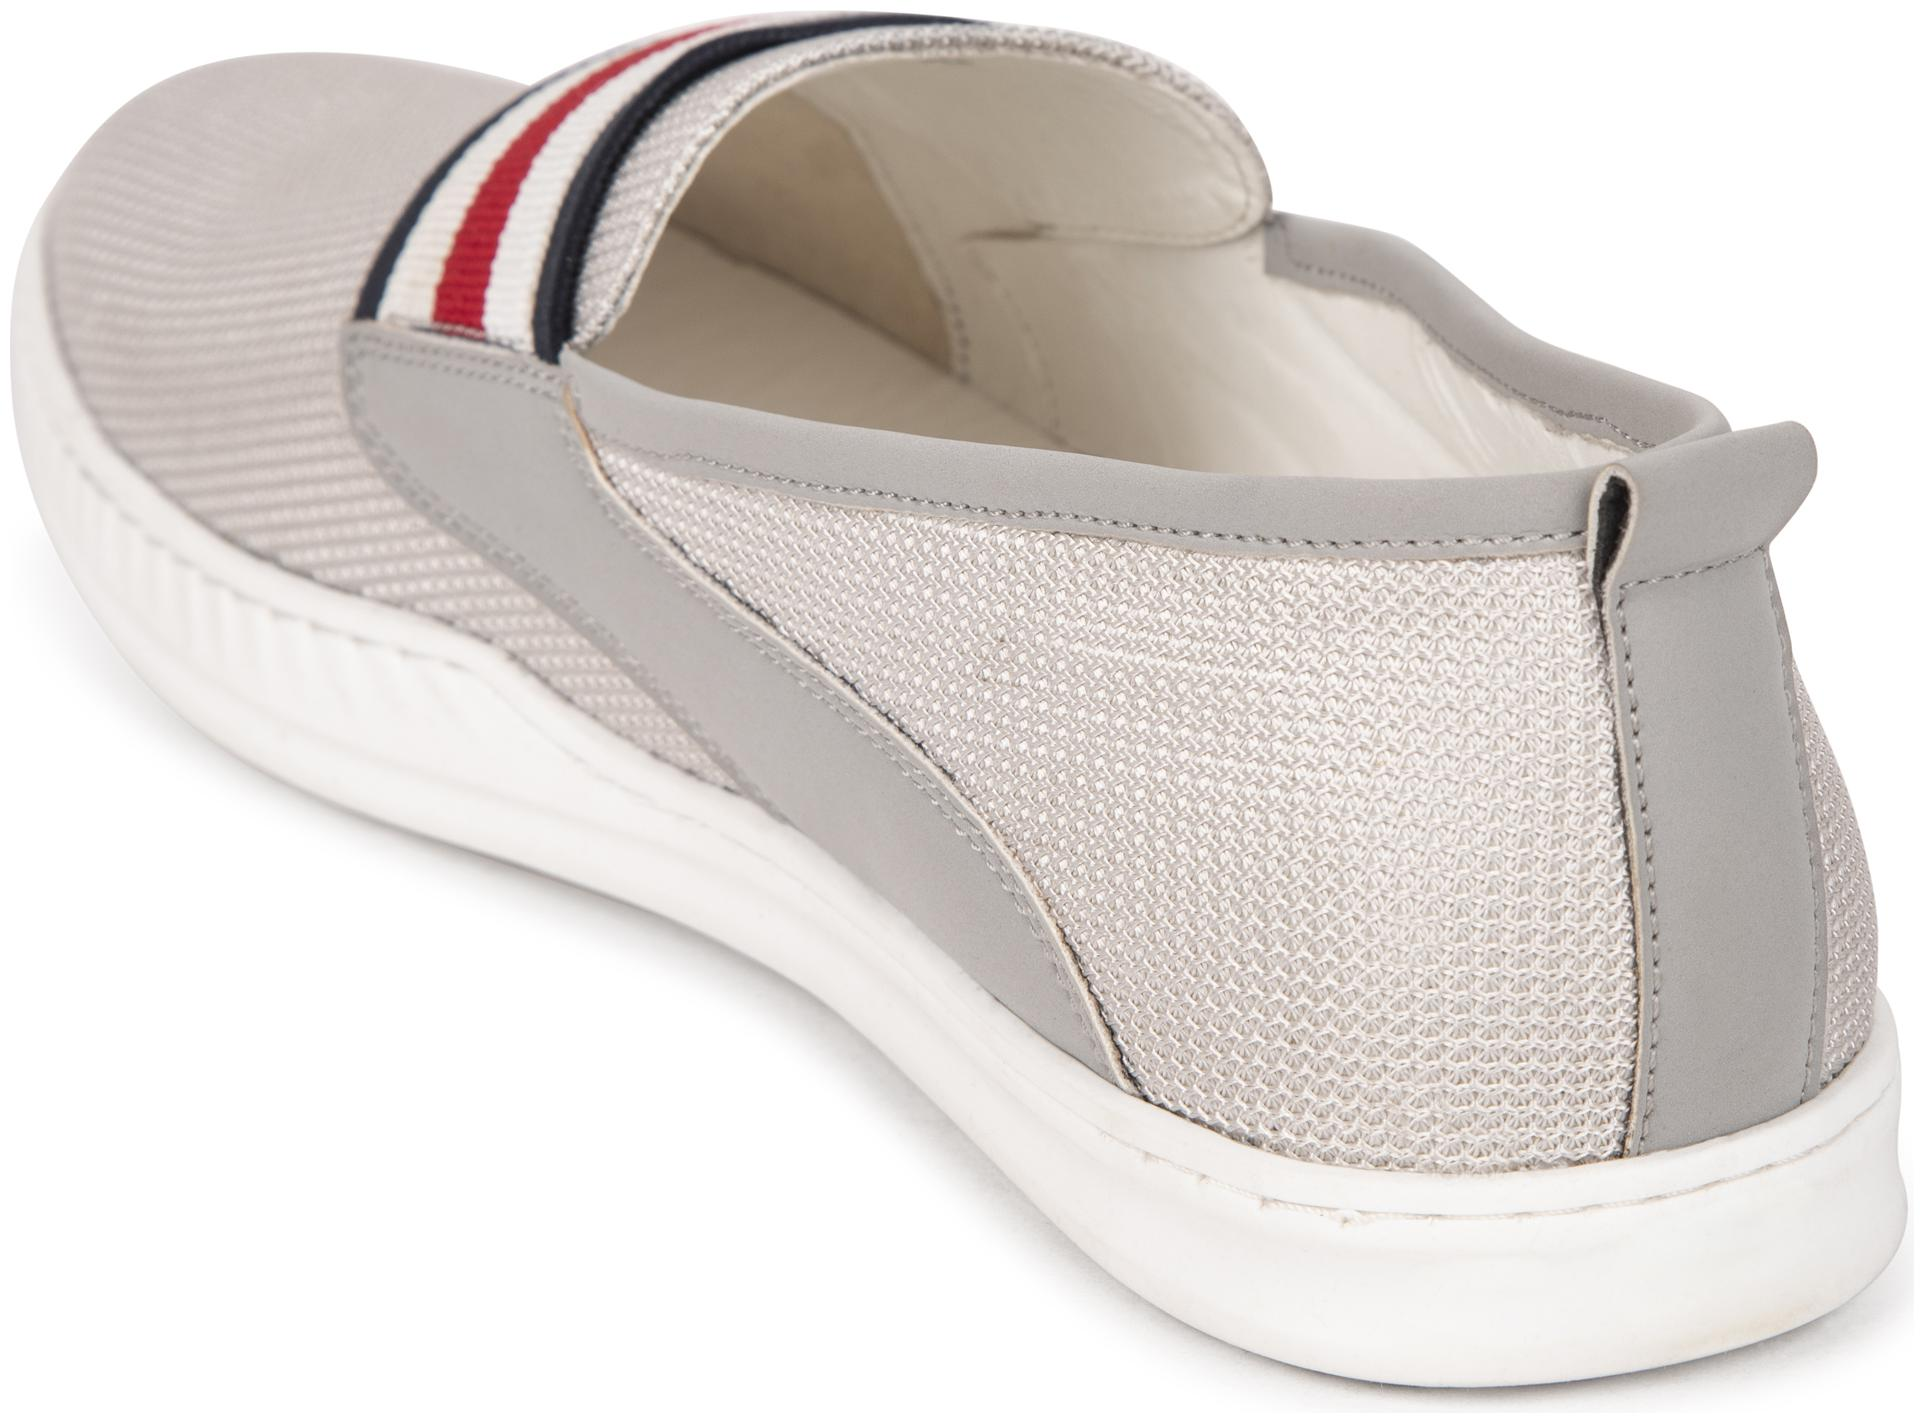 Duke Men Grey Casual Shoes FWOL627-Ux9 CASUAL SHOES